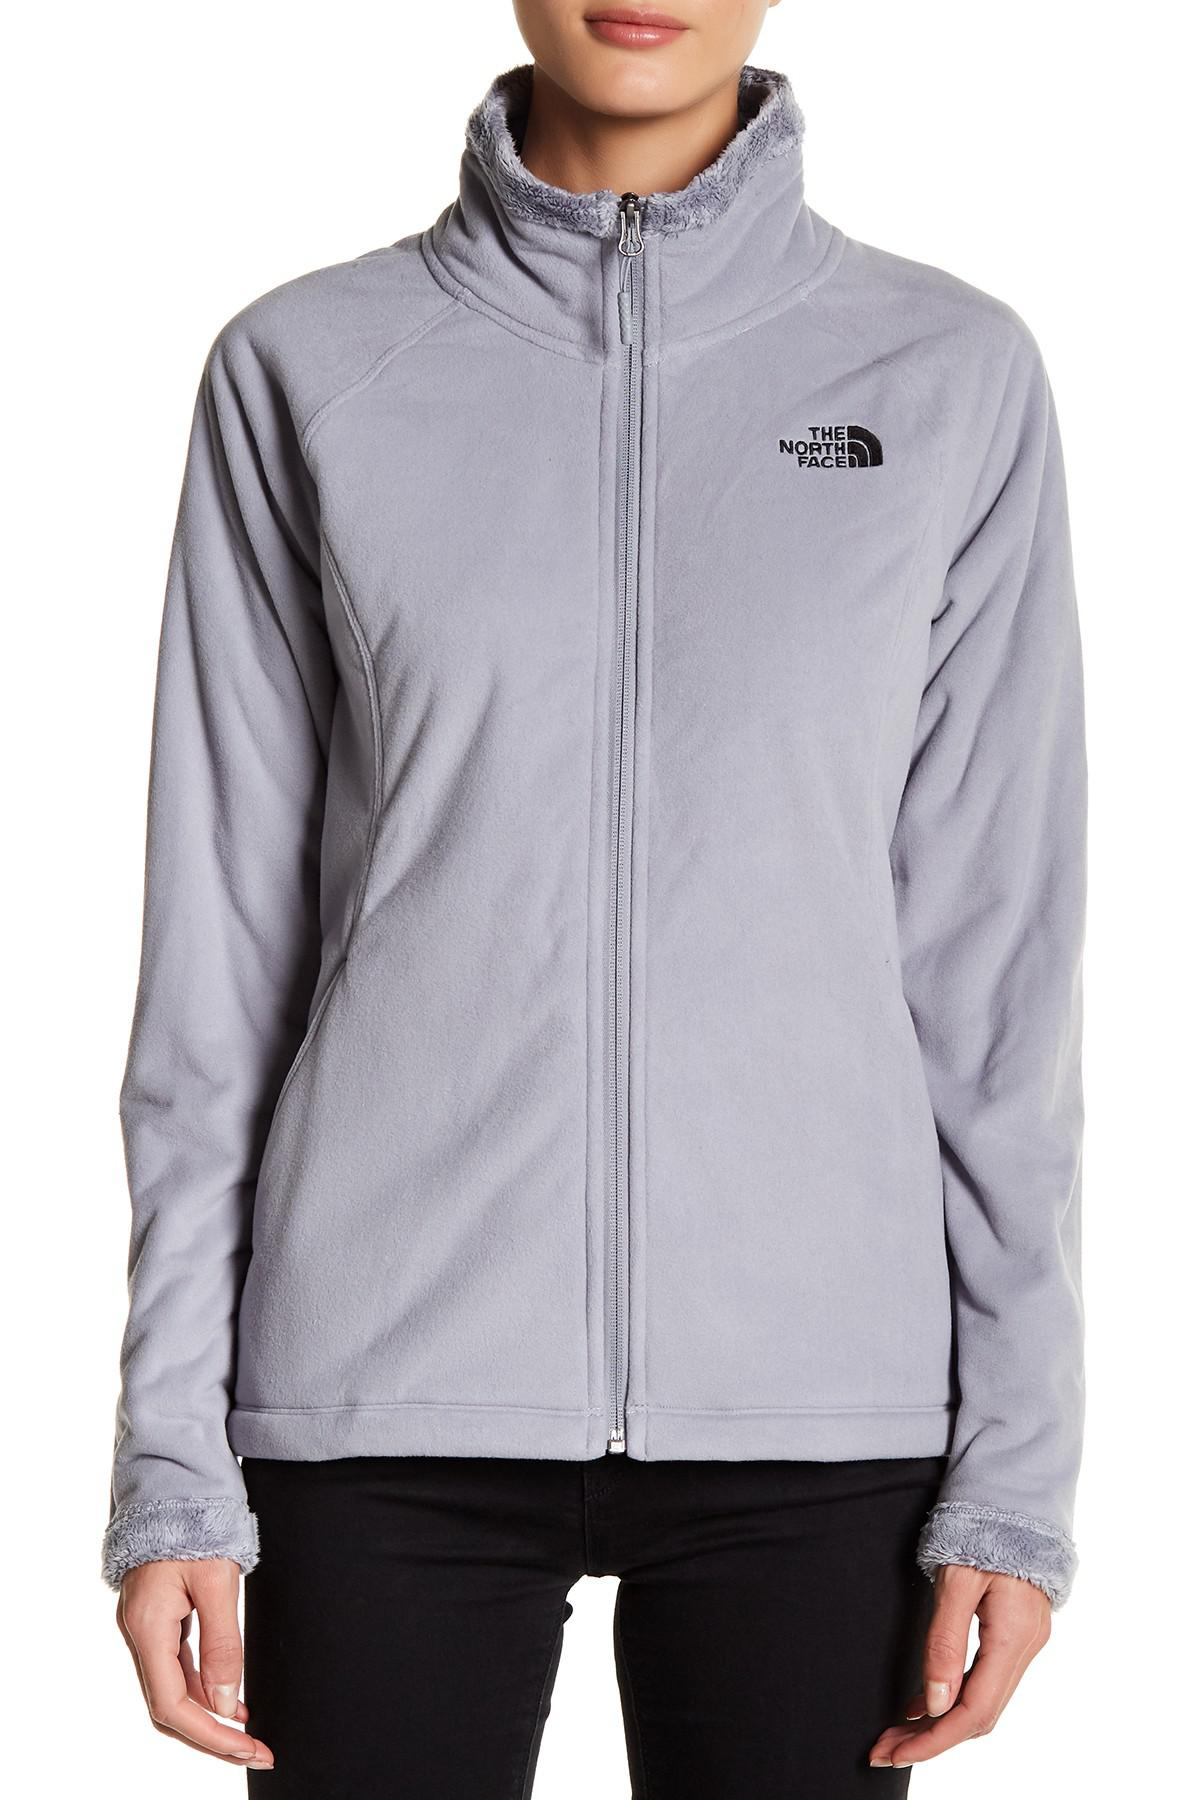 ed8446666 The North Face Gray Morning Glory 2 Jacket